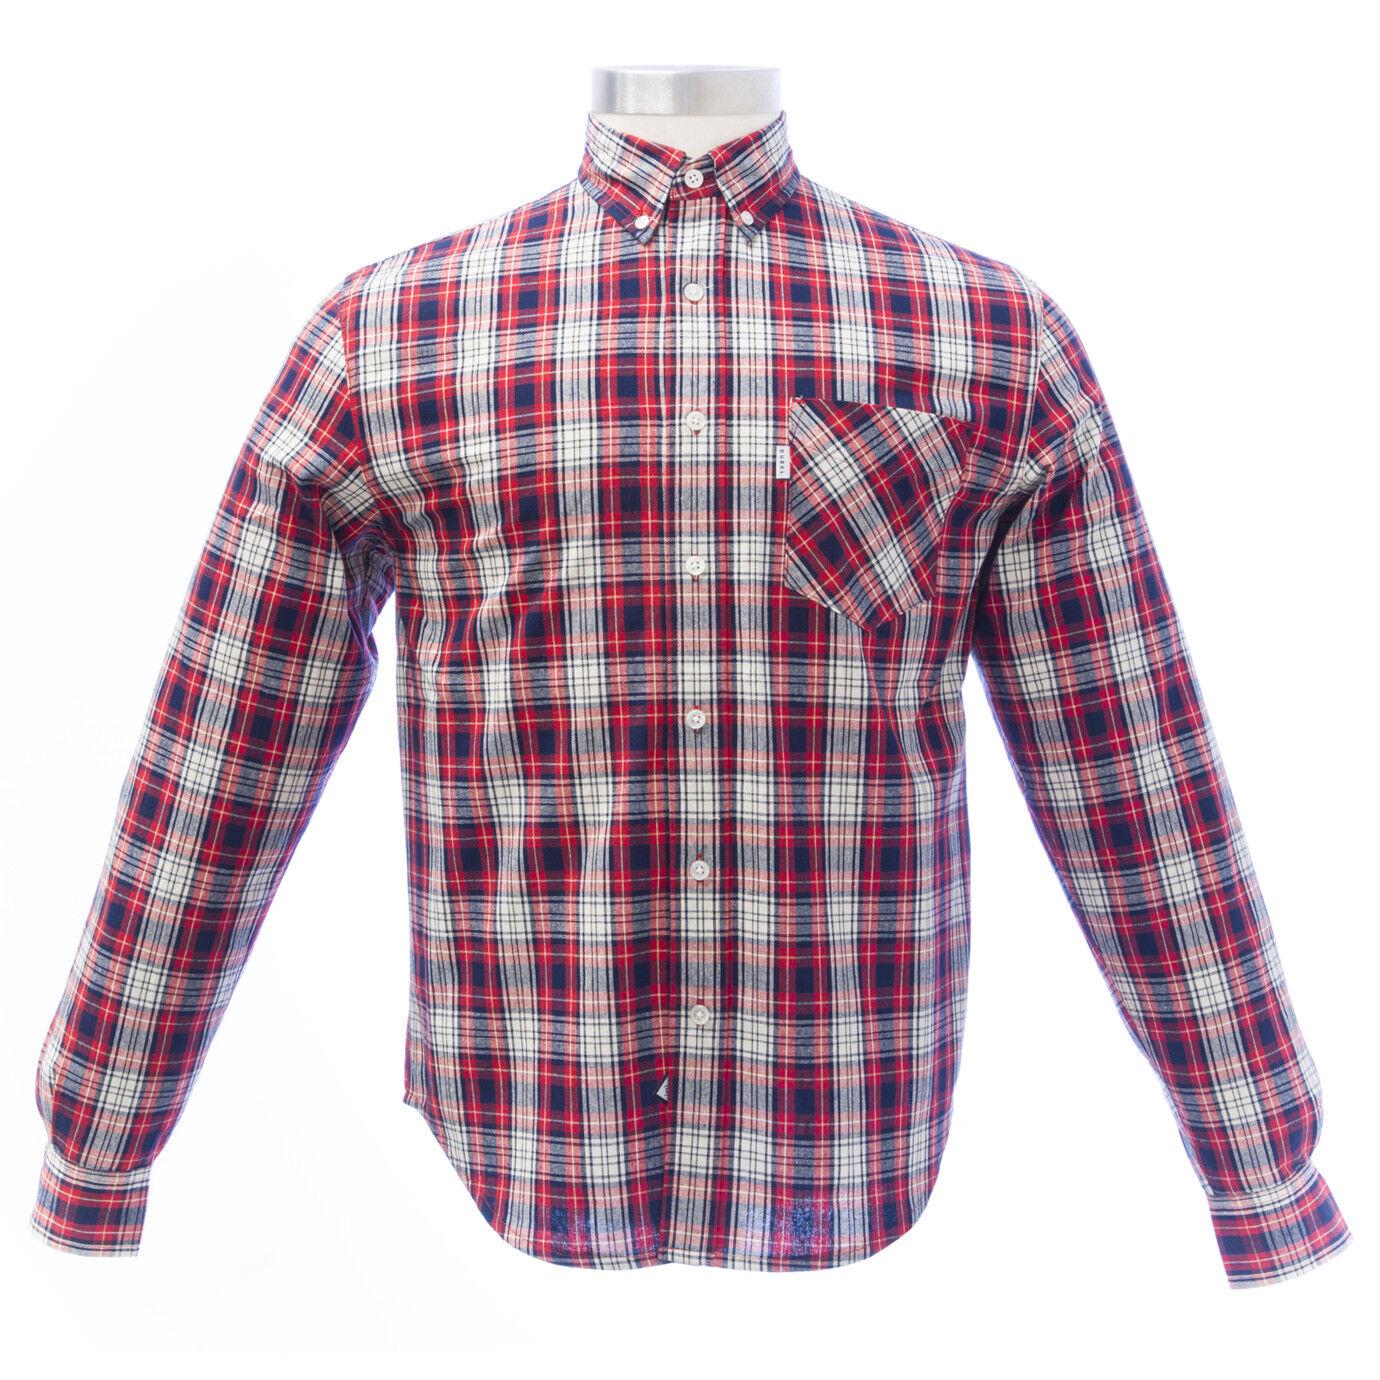 Durkl Men's Red Reissue Plaid Long Sleeve Button-up Shirt 2431 NEW